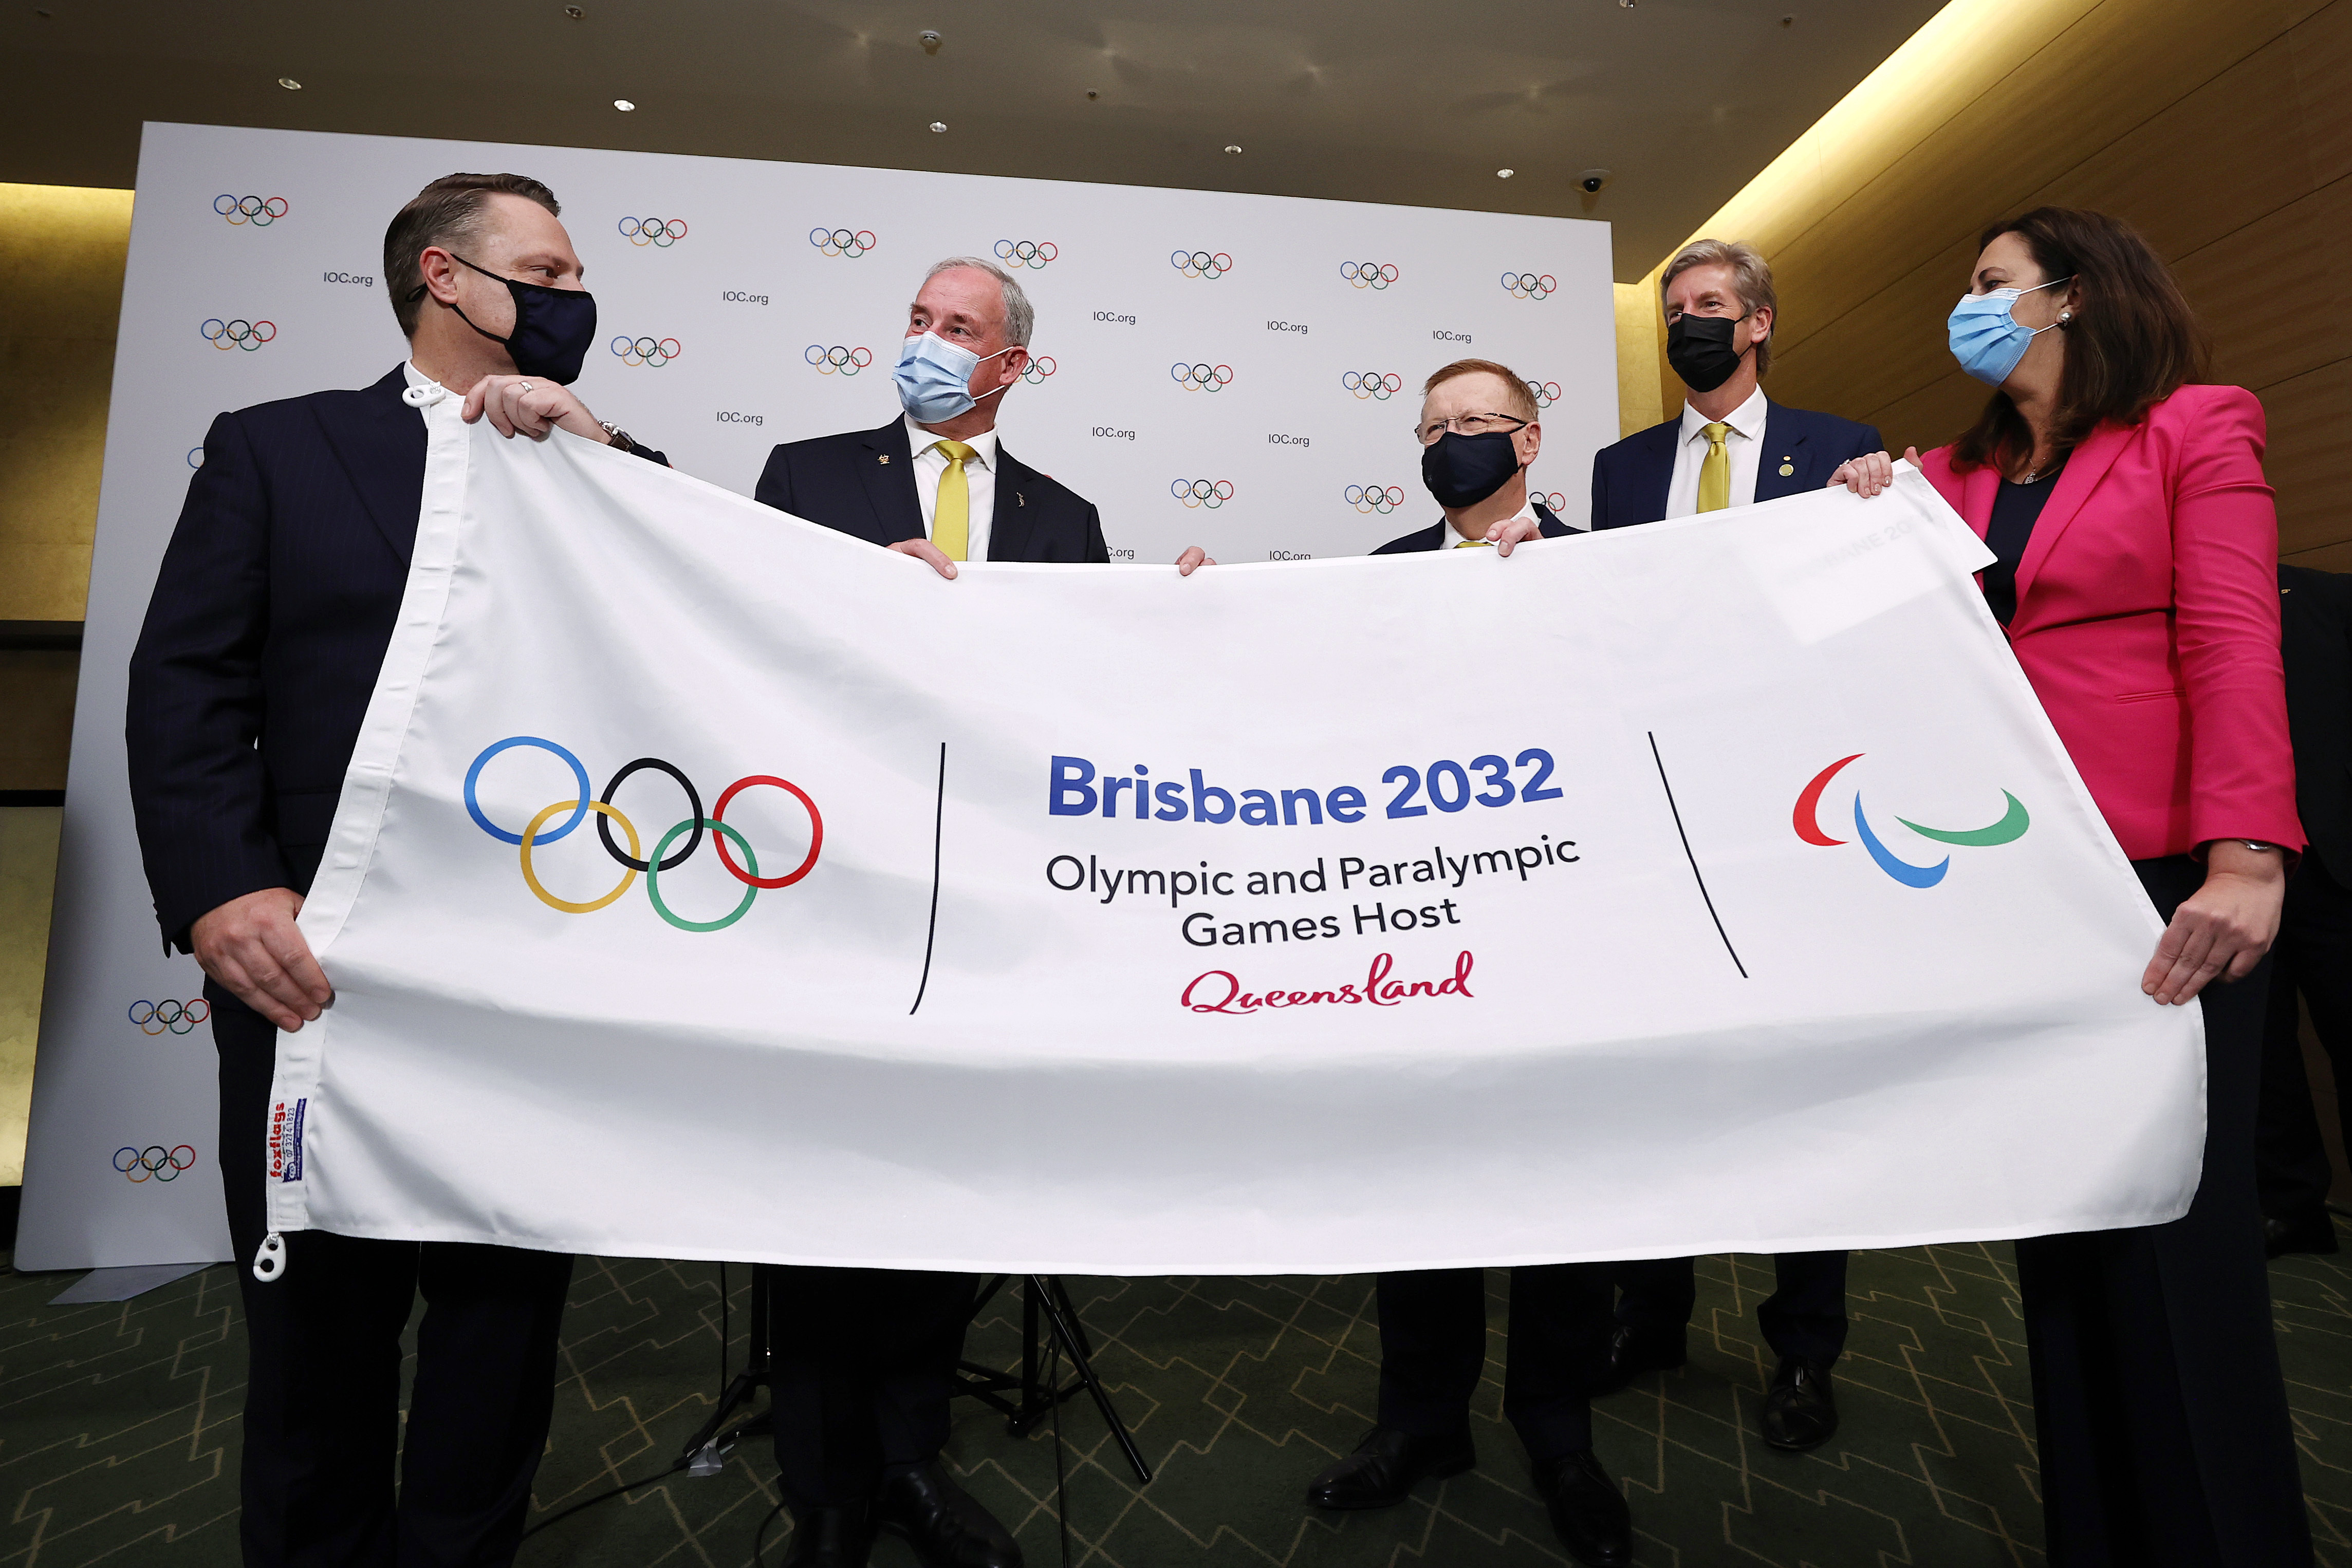 Brisbane to Host 2032 Summer Olympics